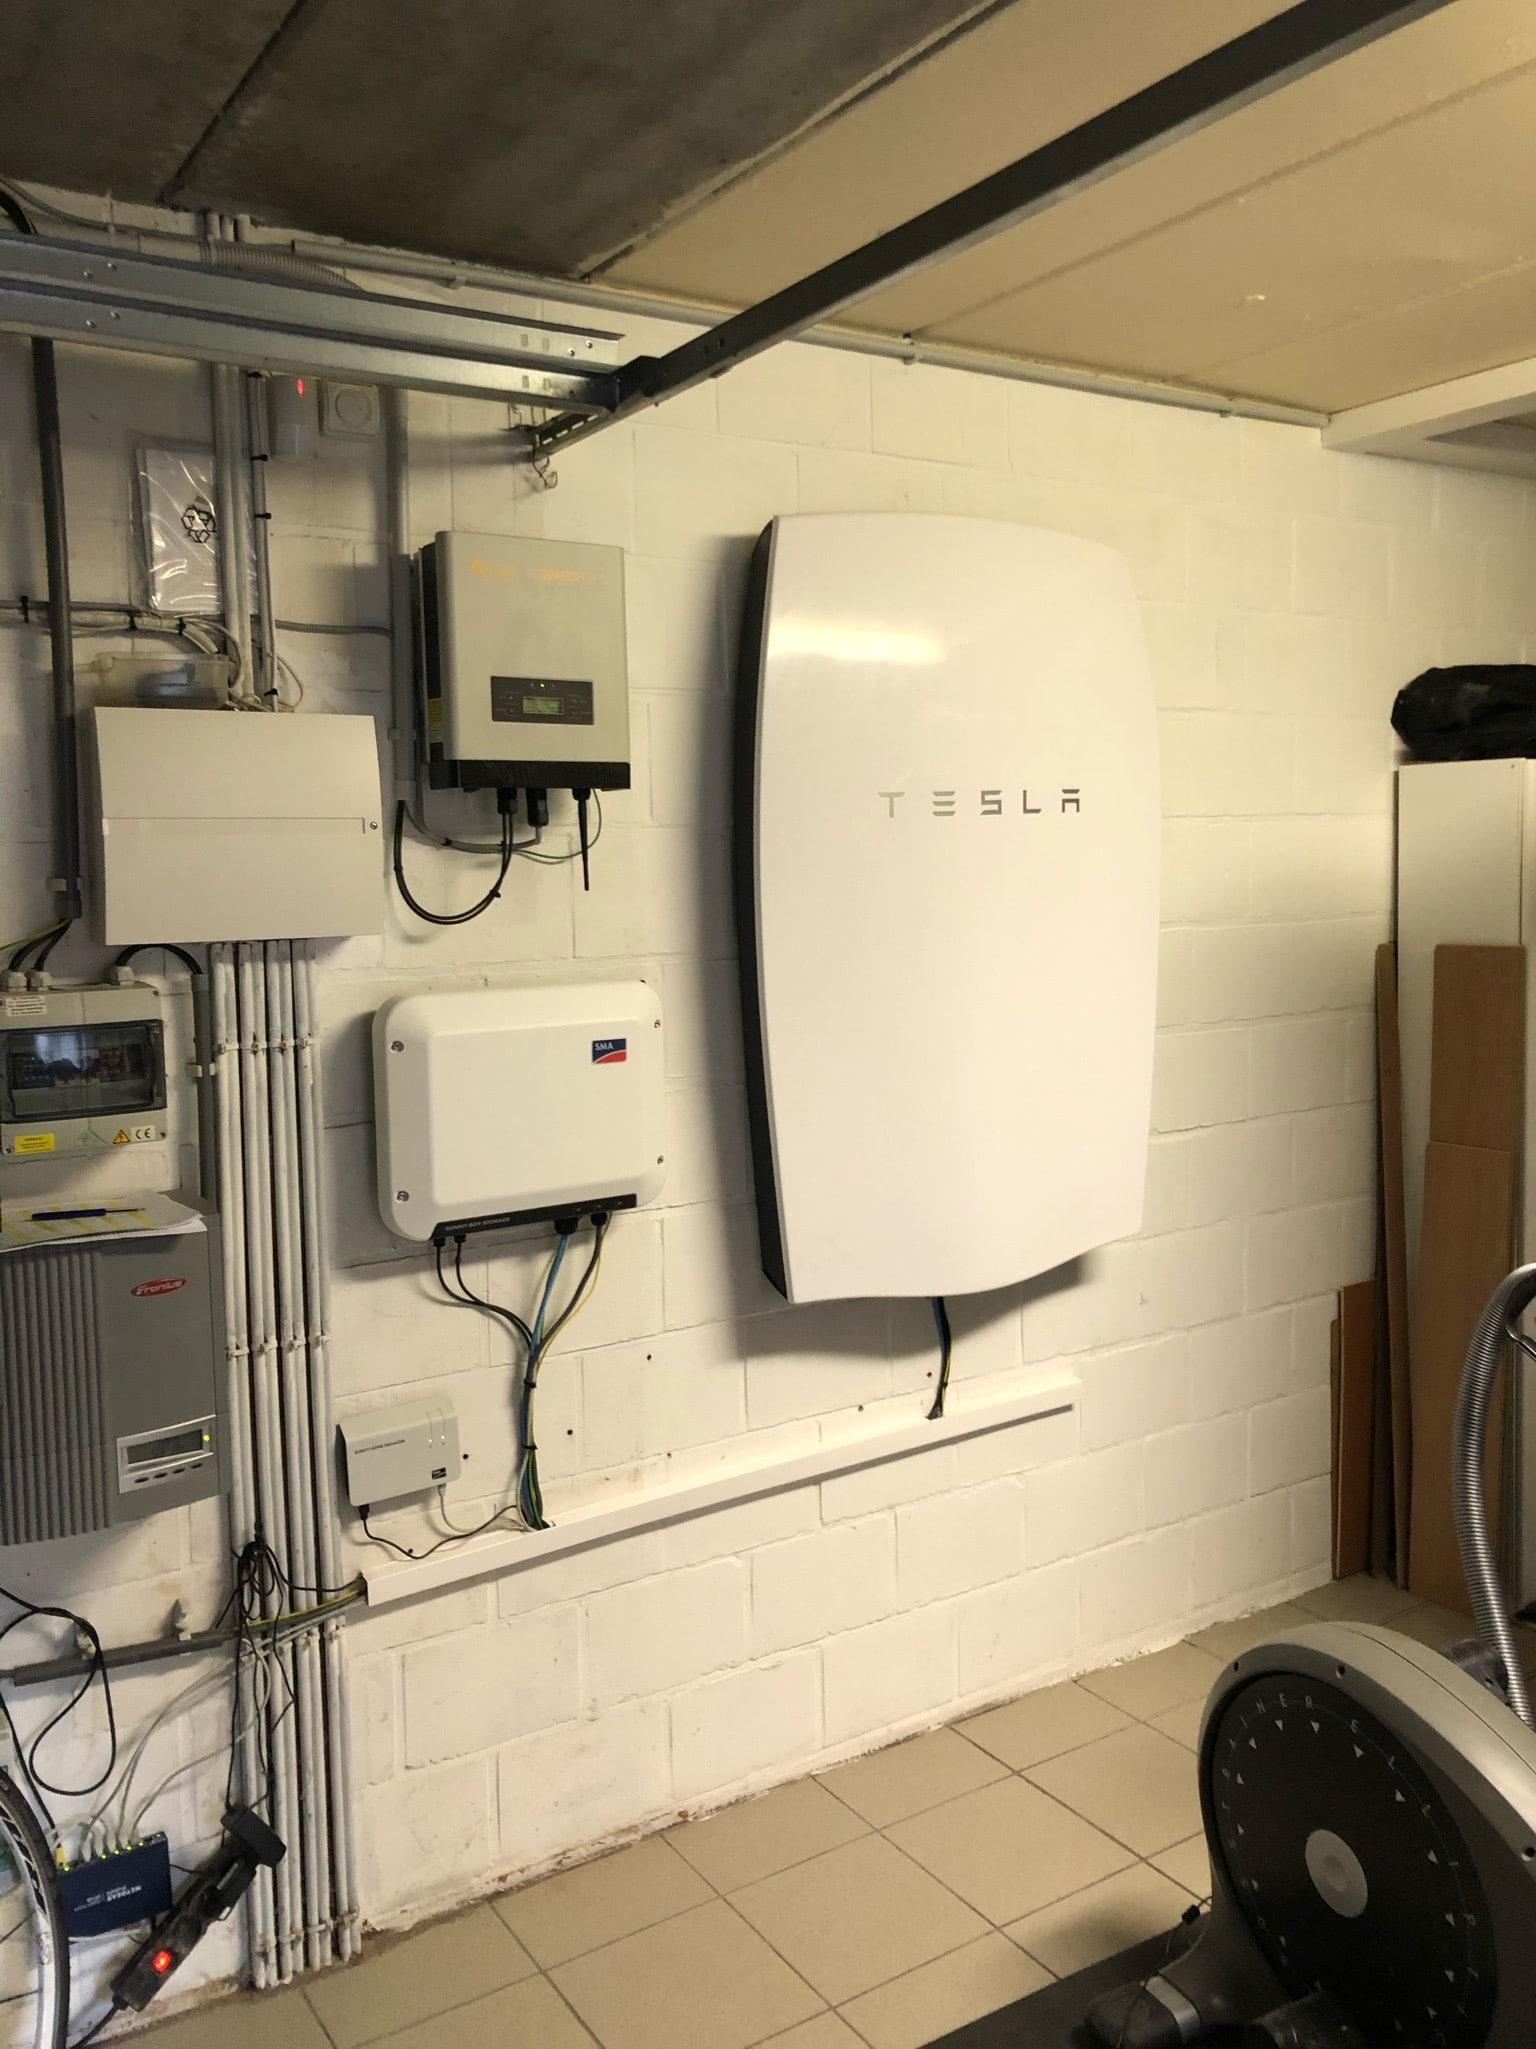 Thuisbatterij Tesla Sint-Katelijne-Waver